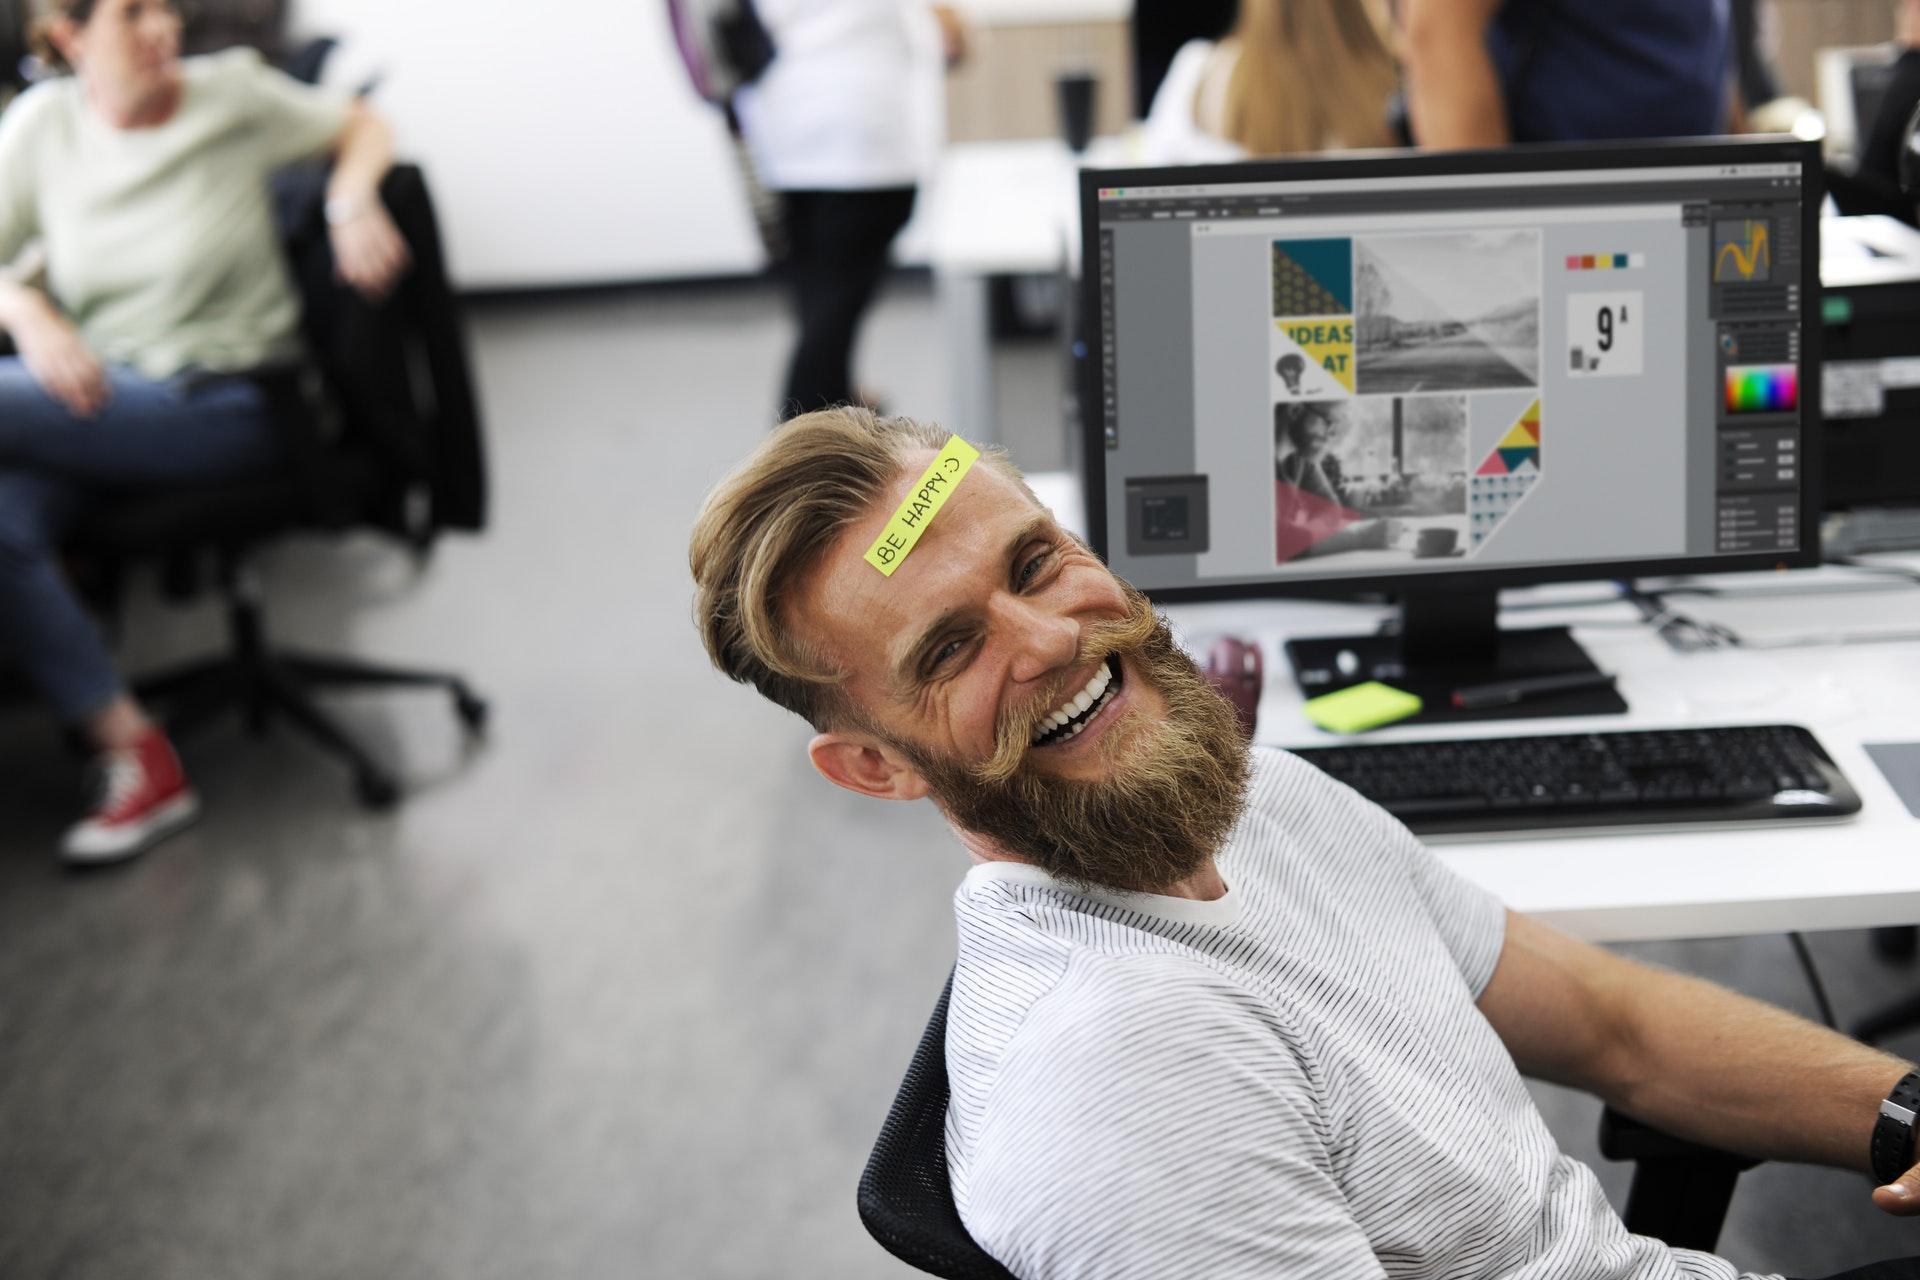 Freude am Arbeitsplatz